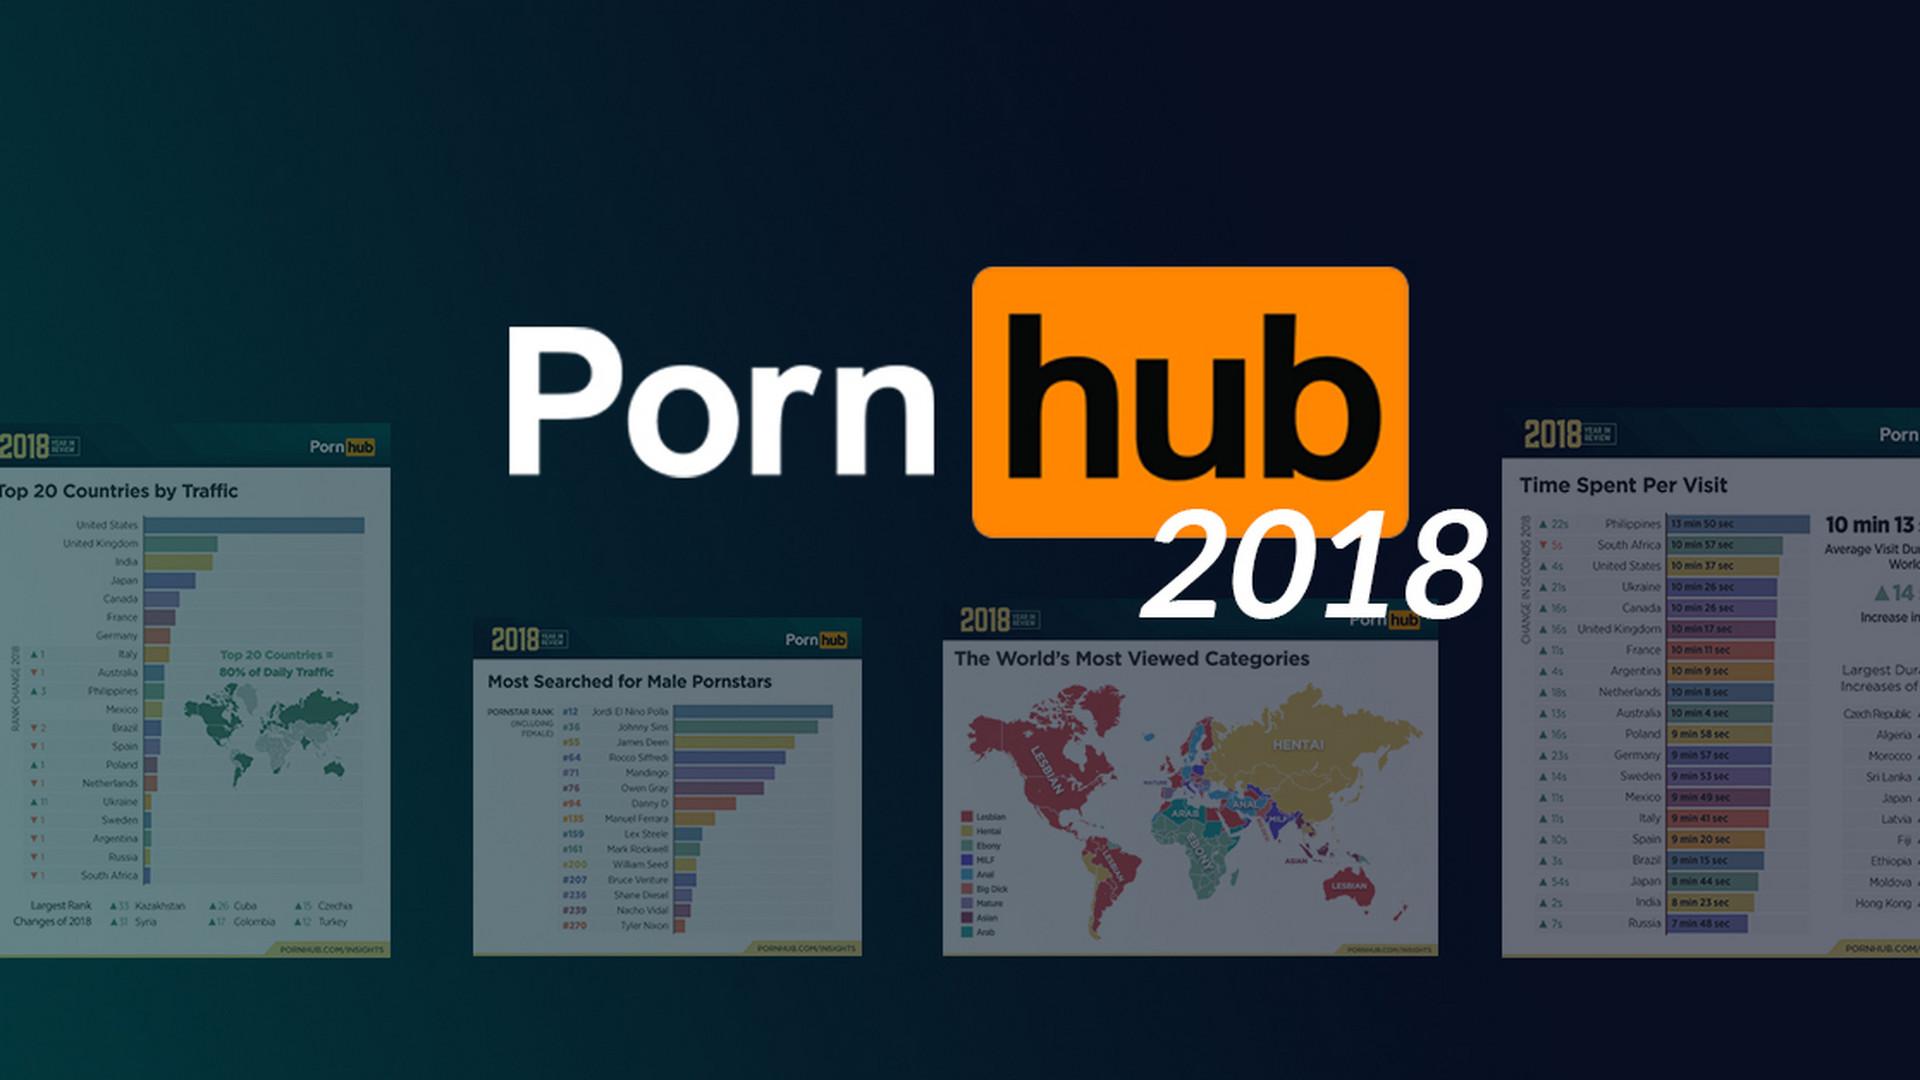 Trojica sex Pornhub